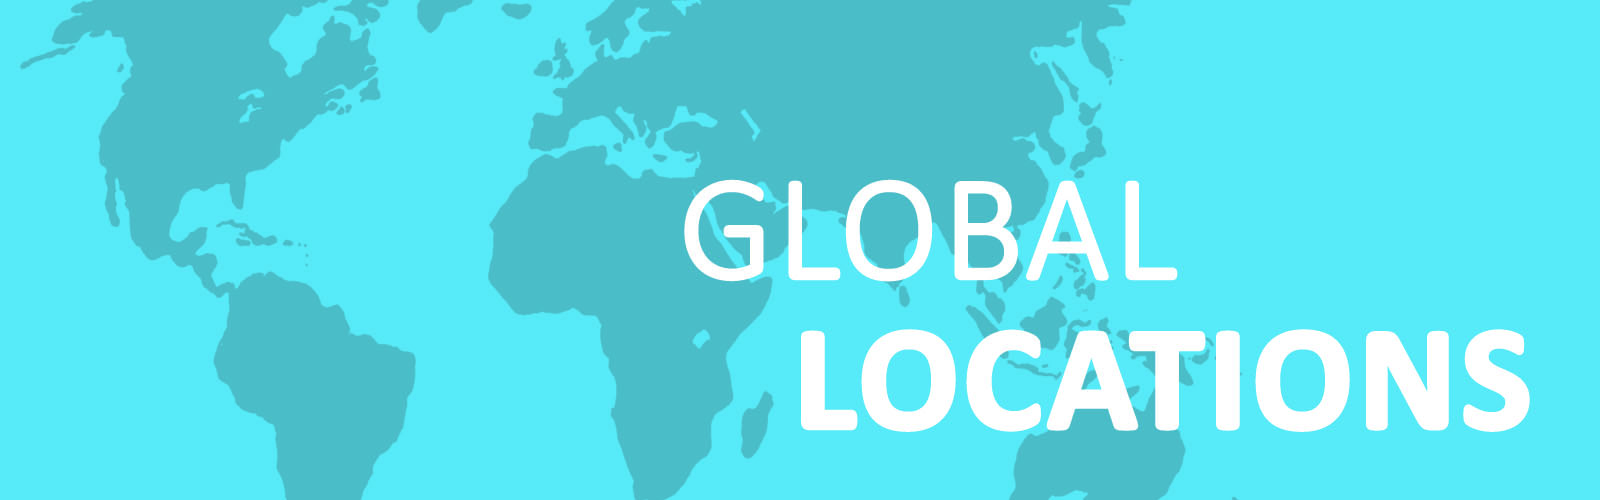 Global Locations - DOVE International